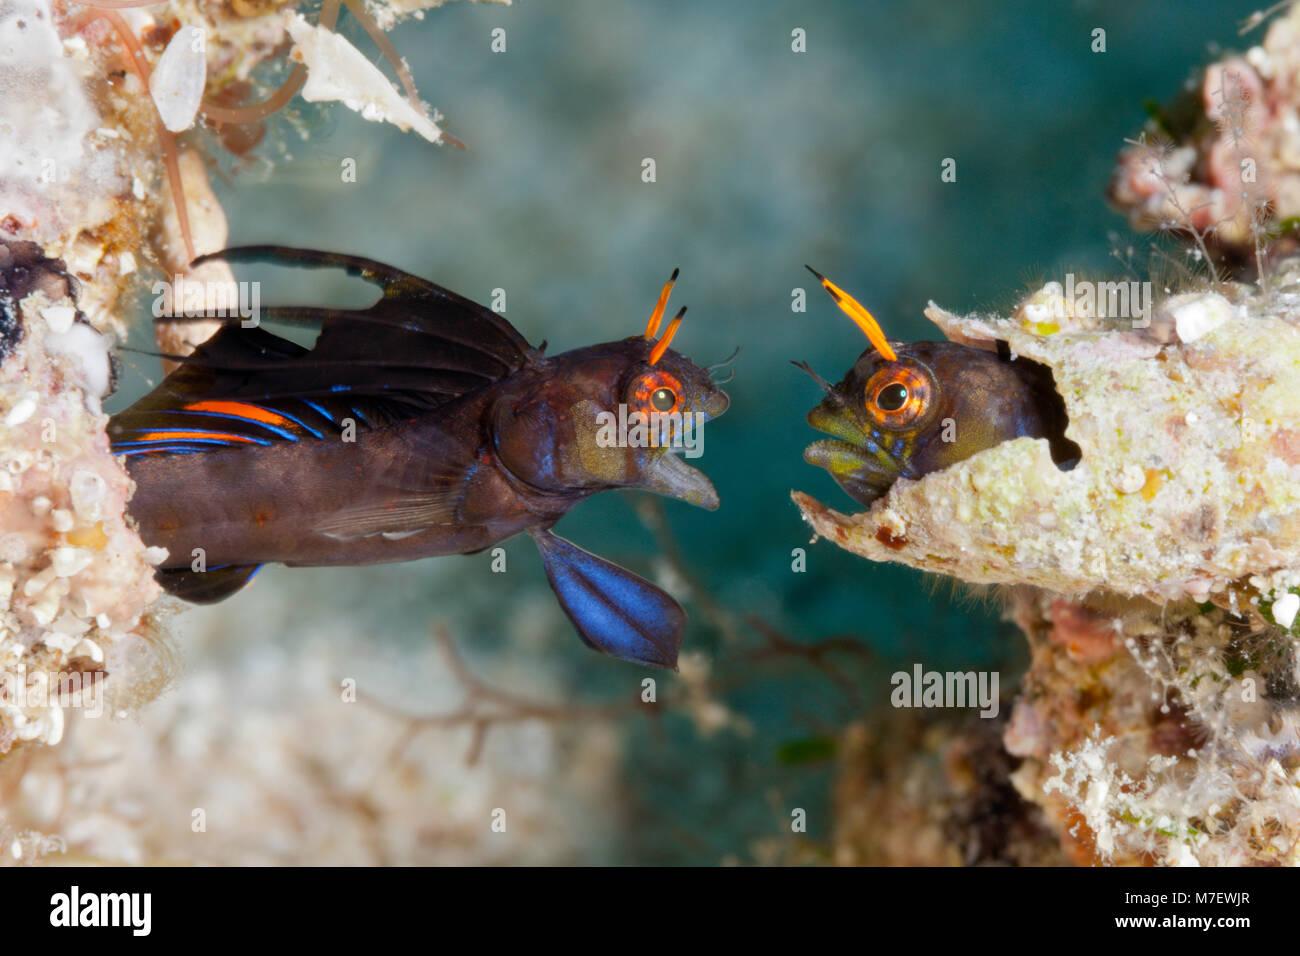 Gulf Signal Blennies in threatening posture, Emblemaria hypacanthus, La Paz, Baja California Sur, Mexico Stock Photo